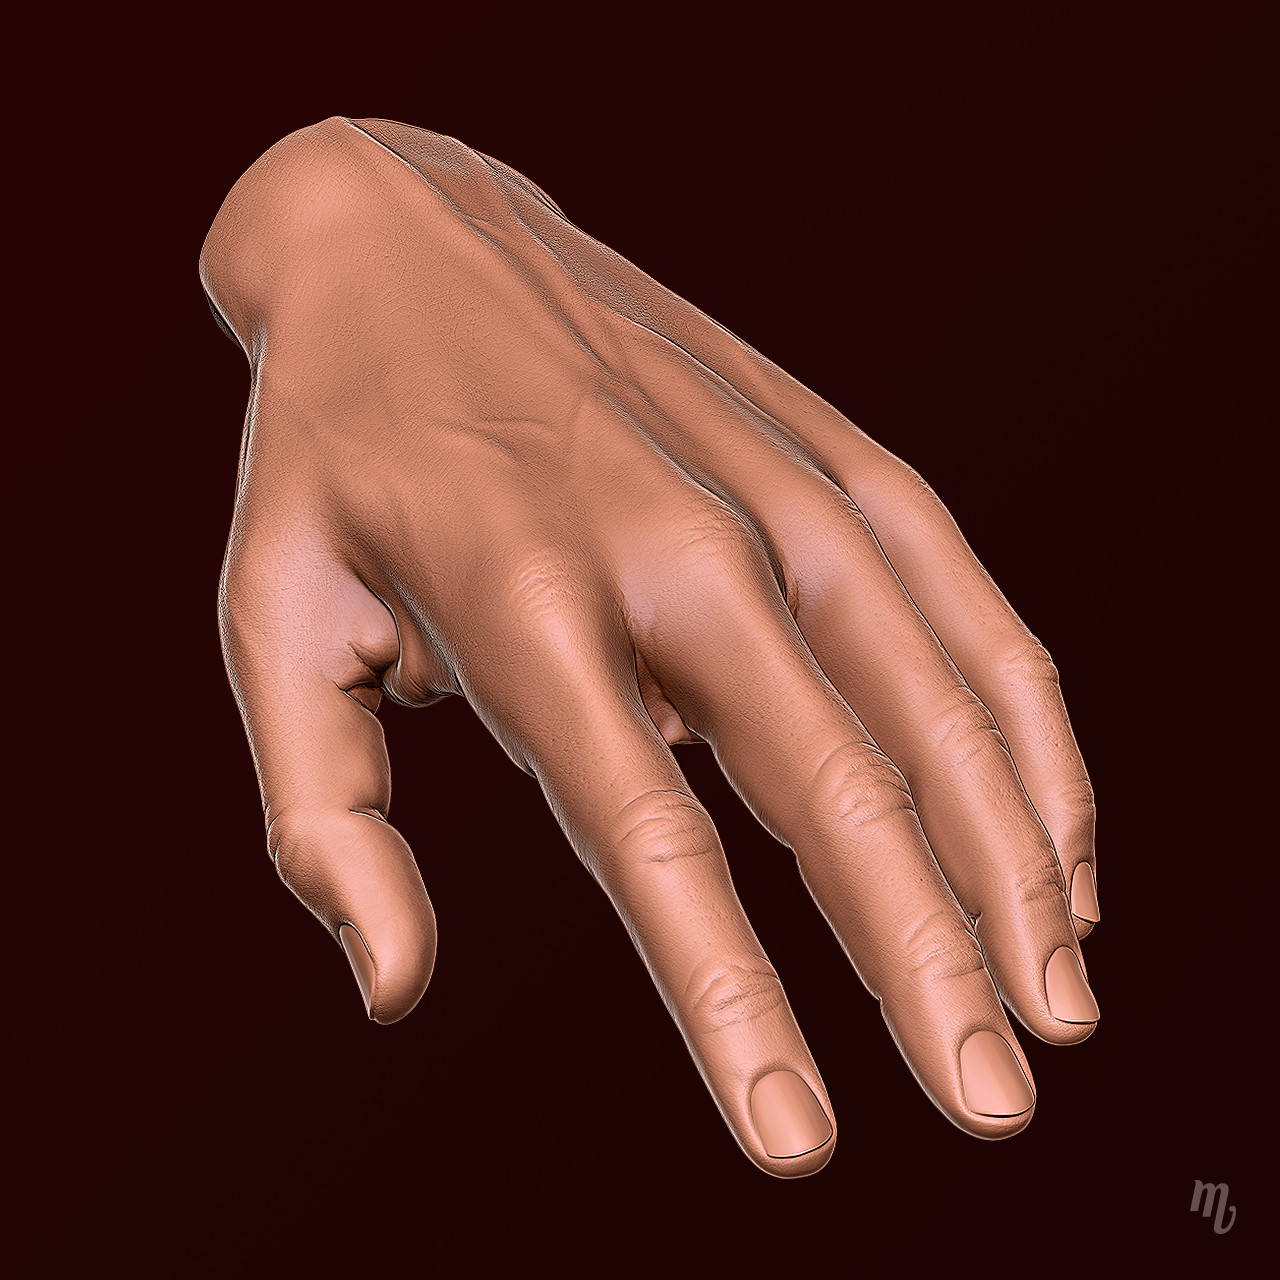 Marc virgili hand 01